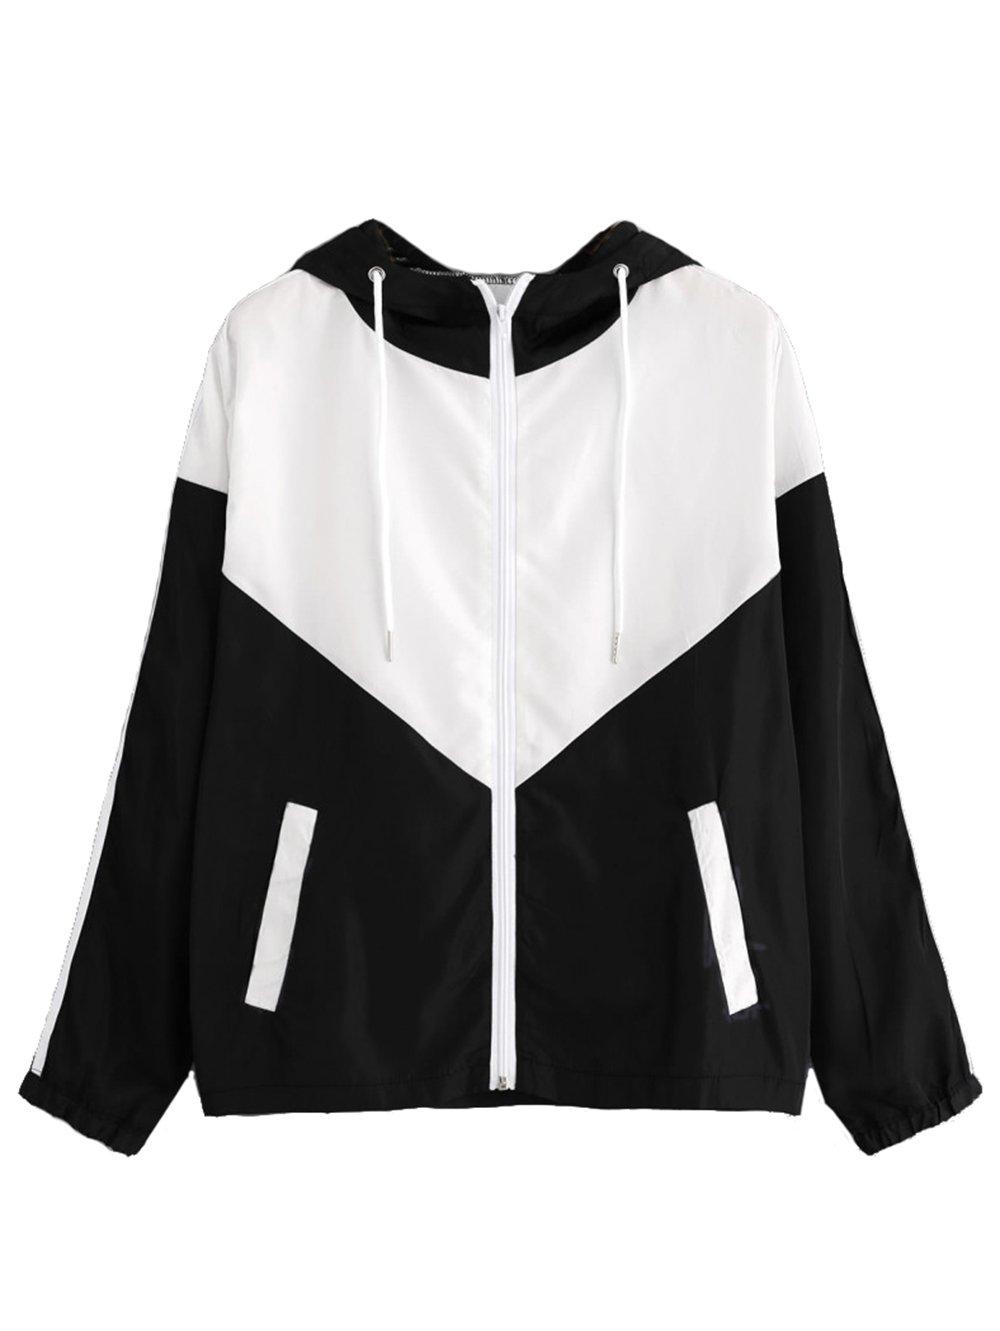 Milumia Women's Color Block Drawstring Hooded Zip Up Lightweight Rain Jacket Hooded Windbreaker